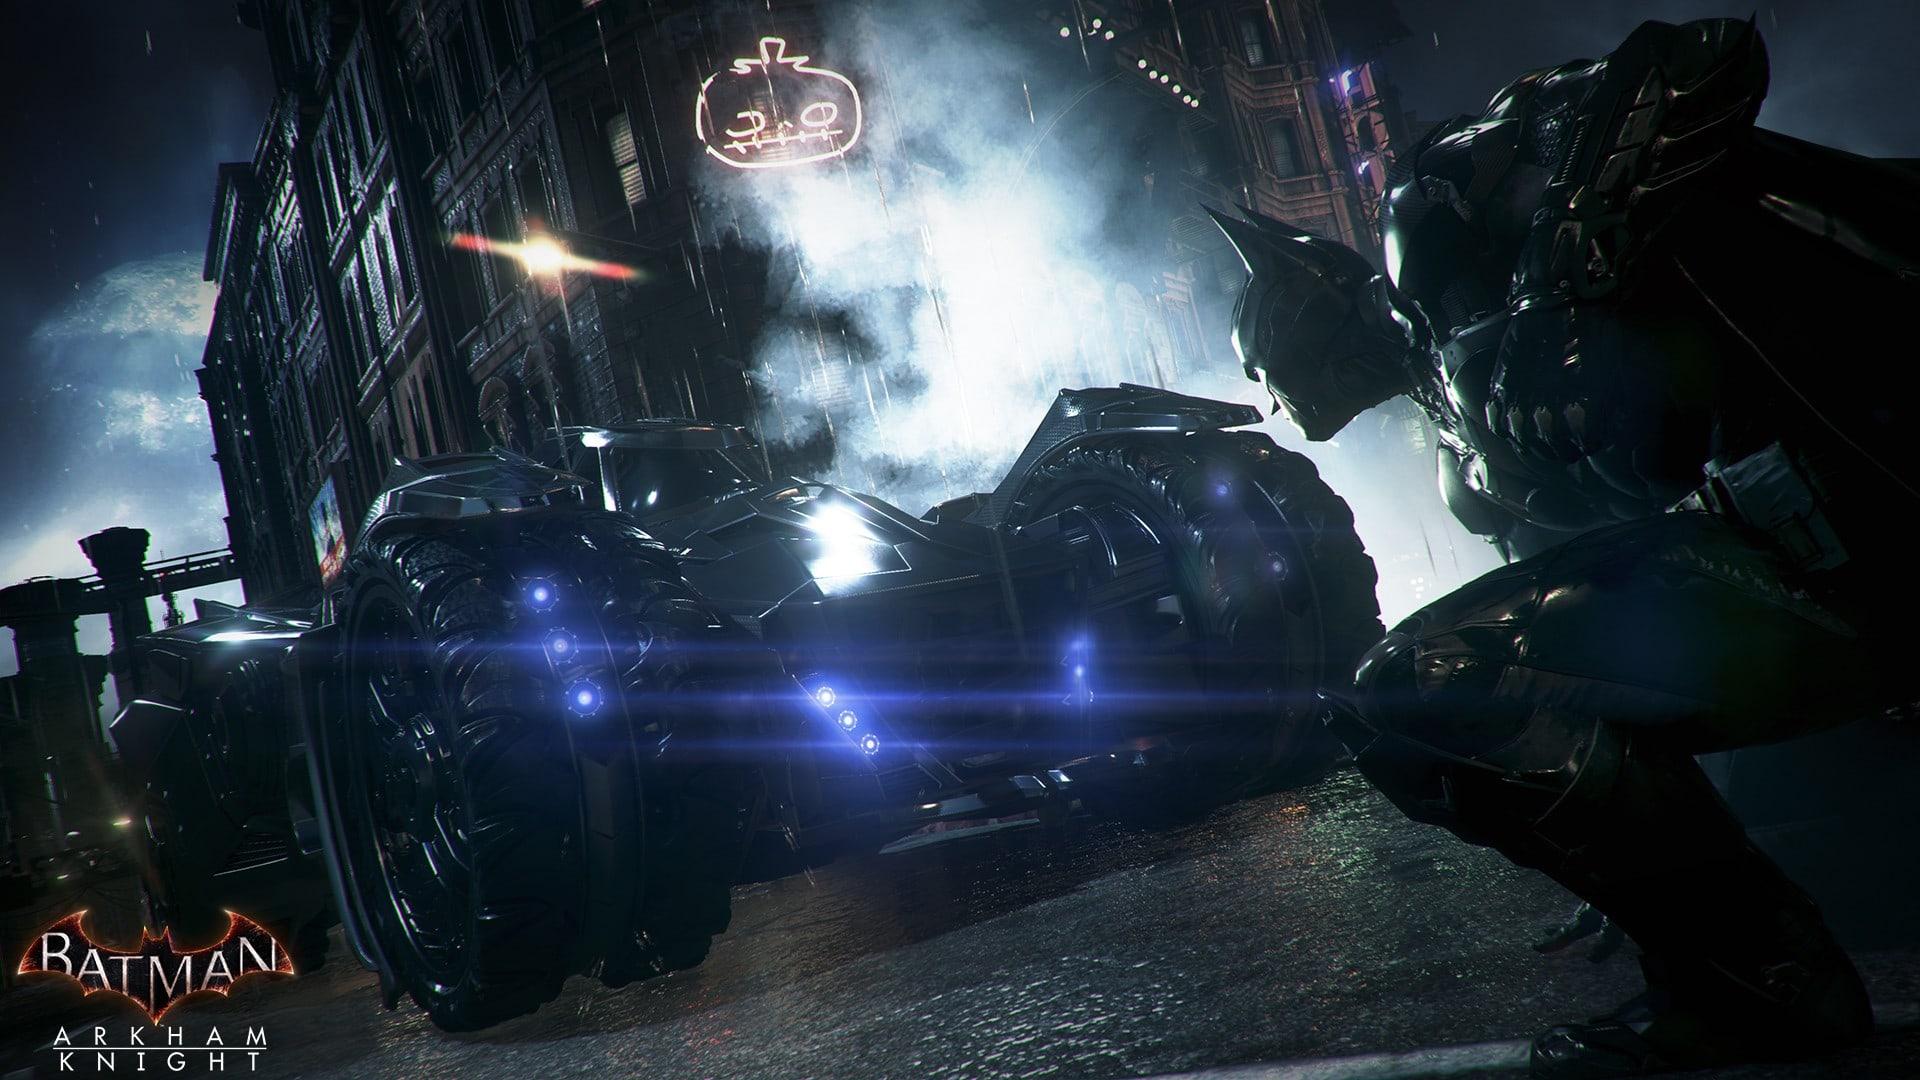 Batman Arkham Knight Batmobile HD desktop wallpaper